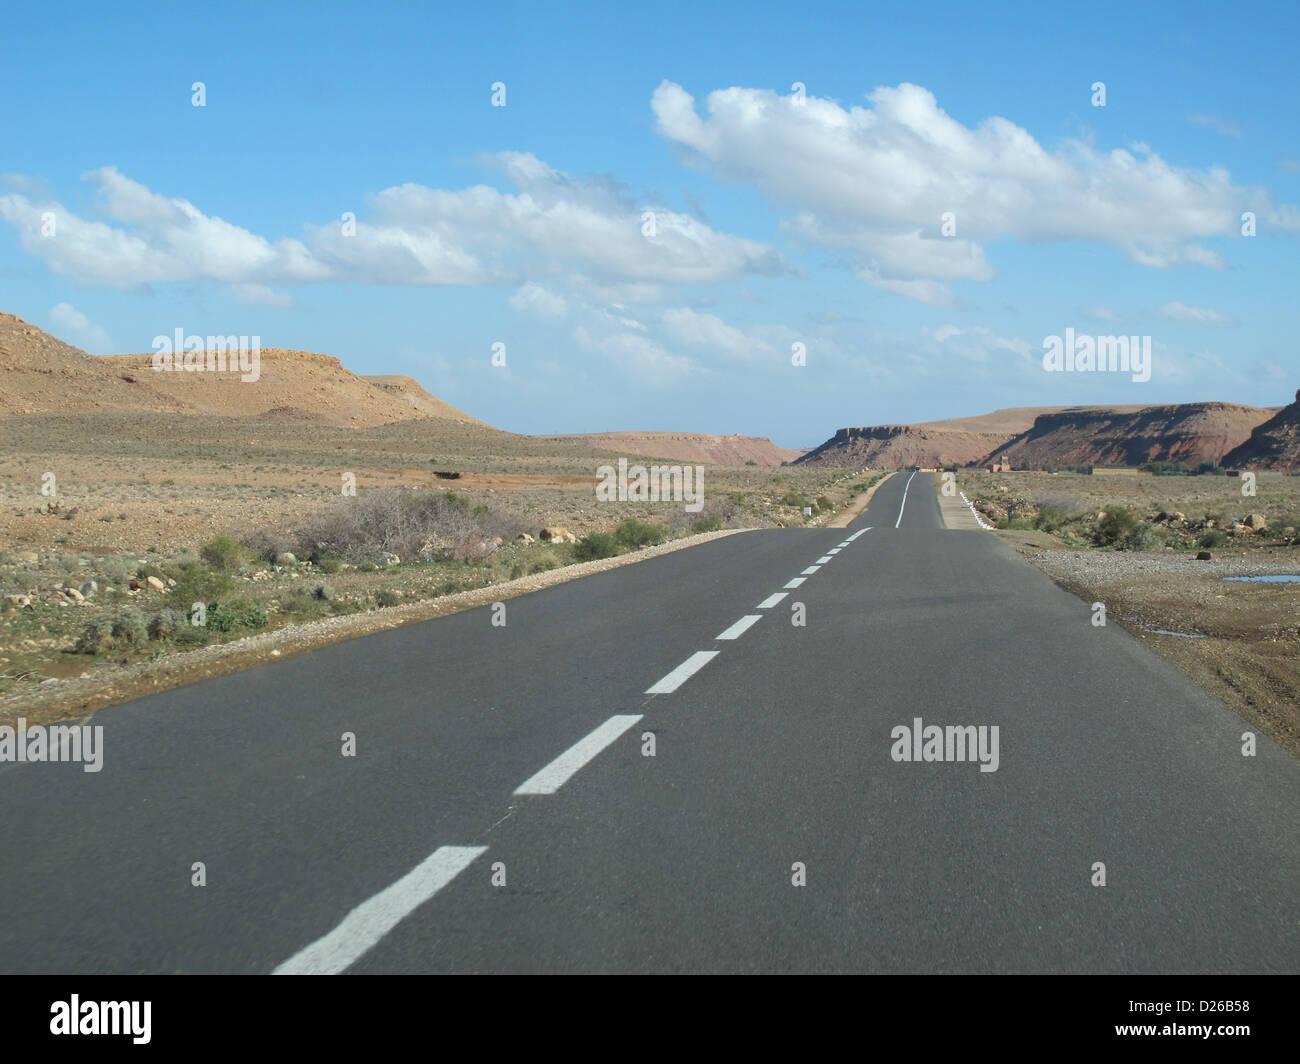 Road in the Sahara Desert - Stock Image